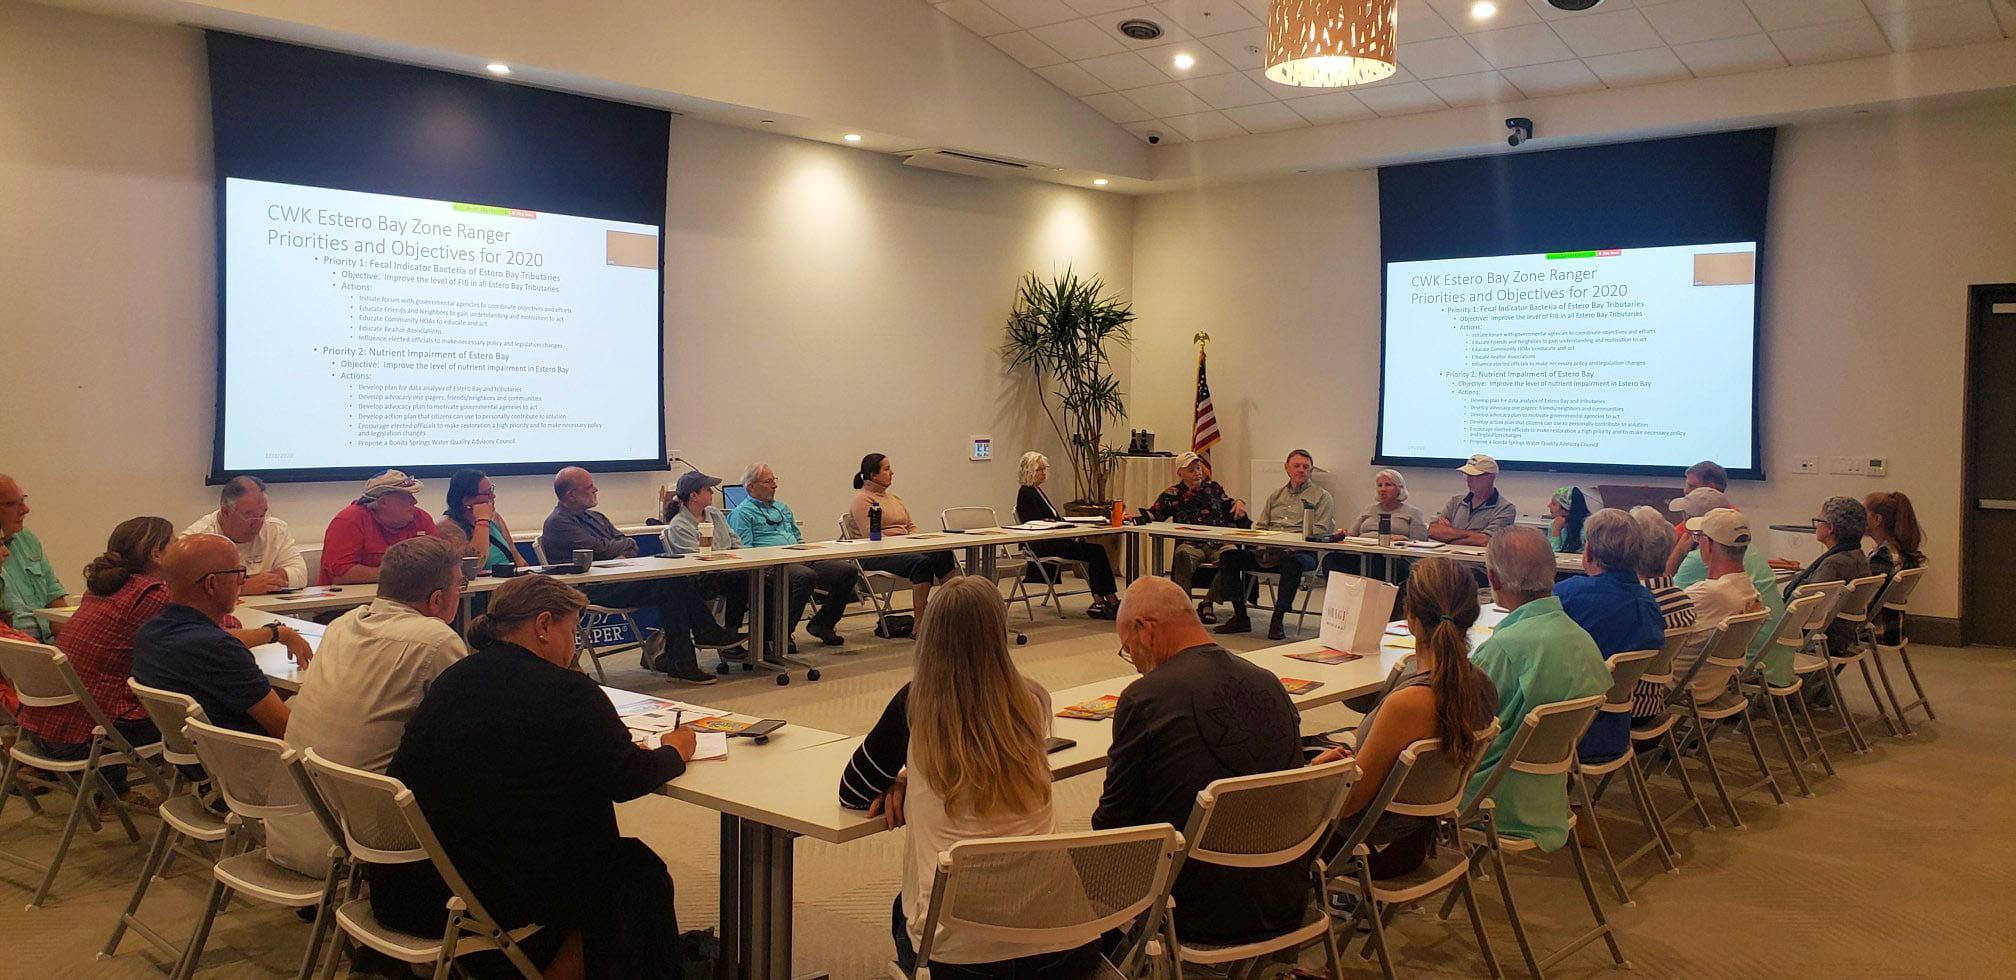 CWK Quarterly Ranger Meeting - Winter 2020